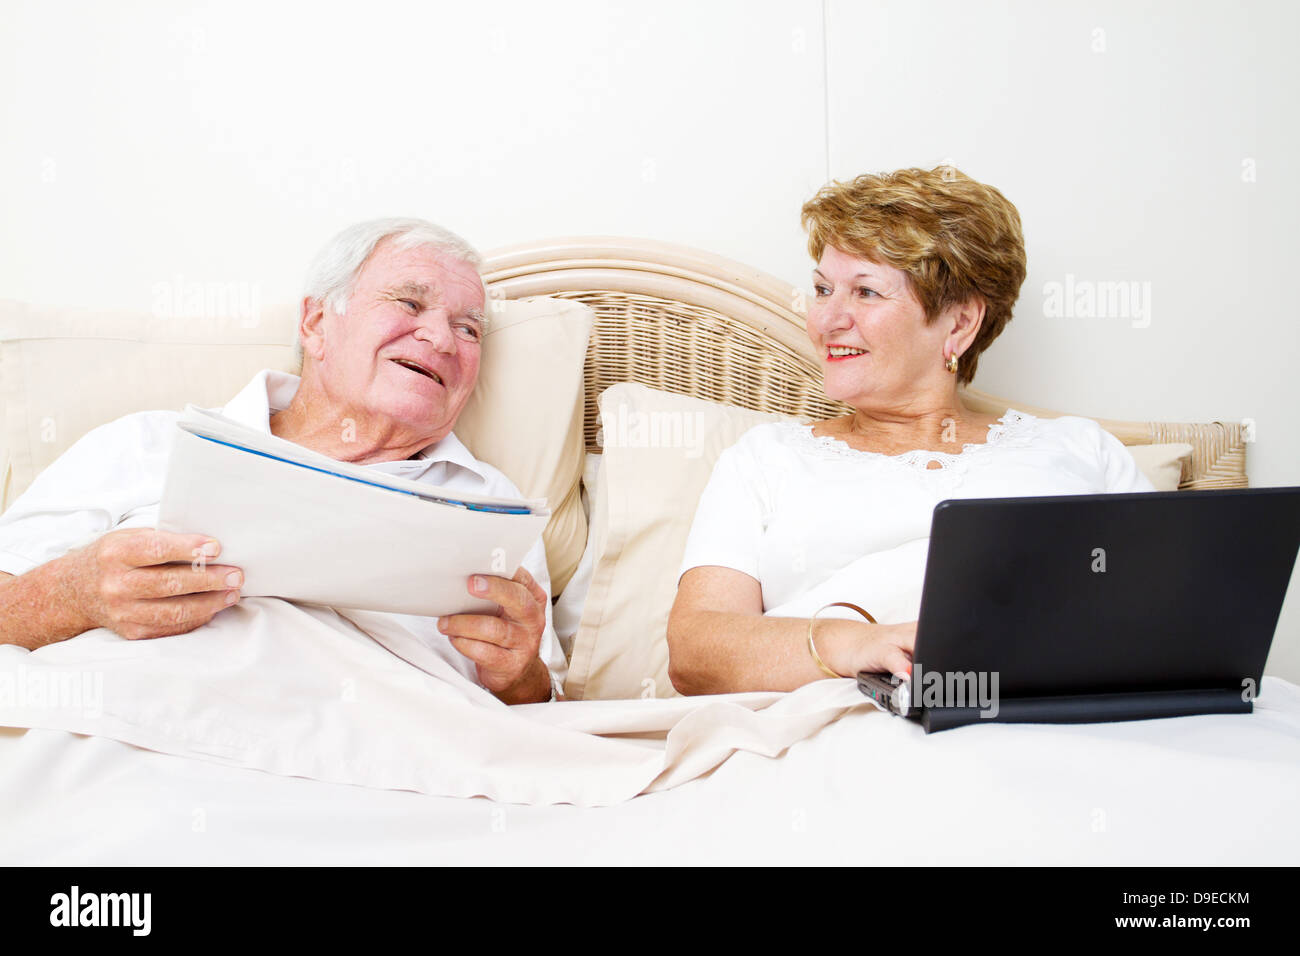 Mature Couple Bed Laugh Stock Photos  Mature Couple Bed Laugh Stock Images - Alamy-8607